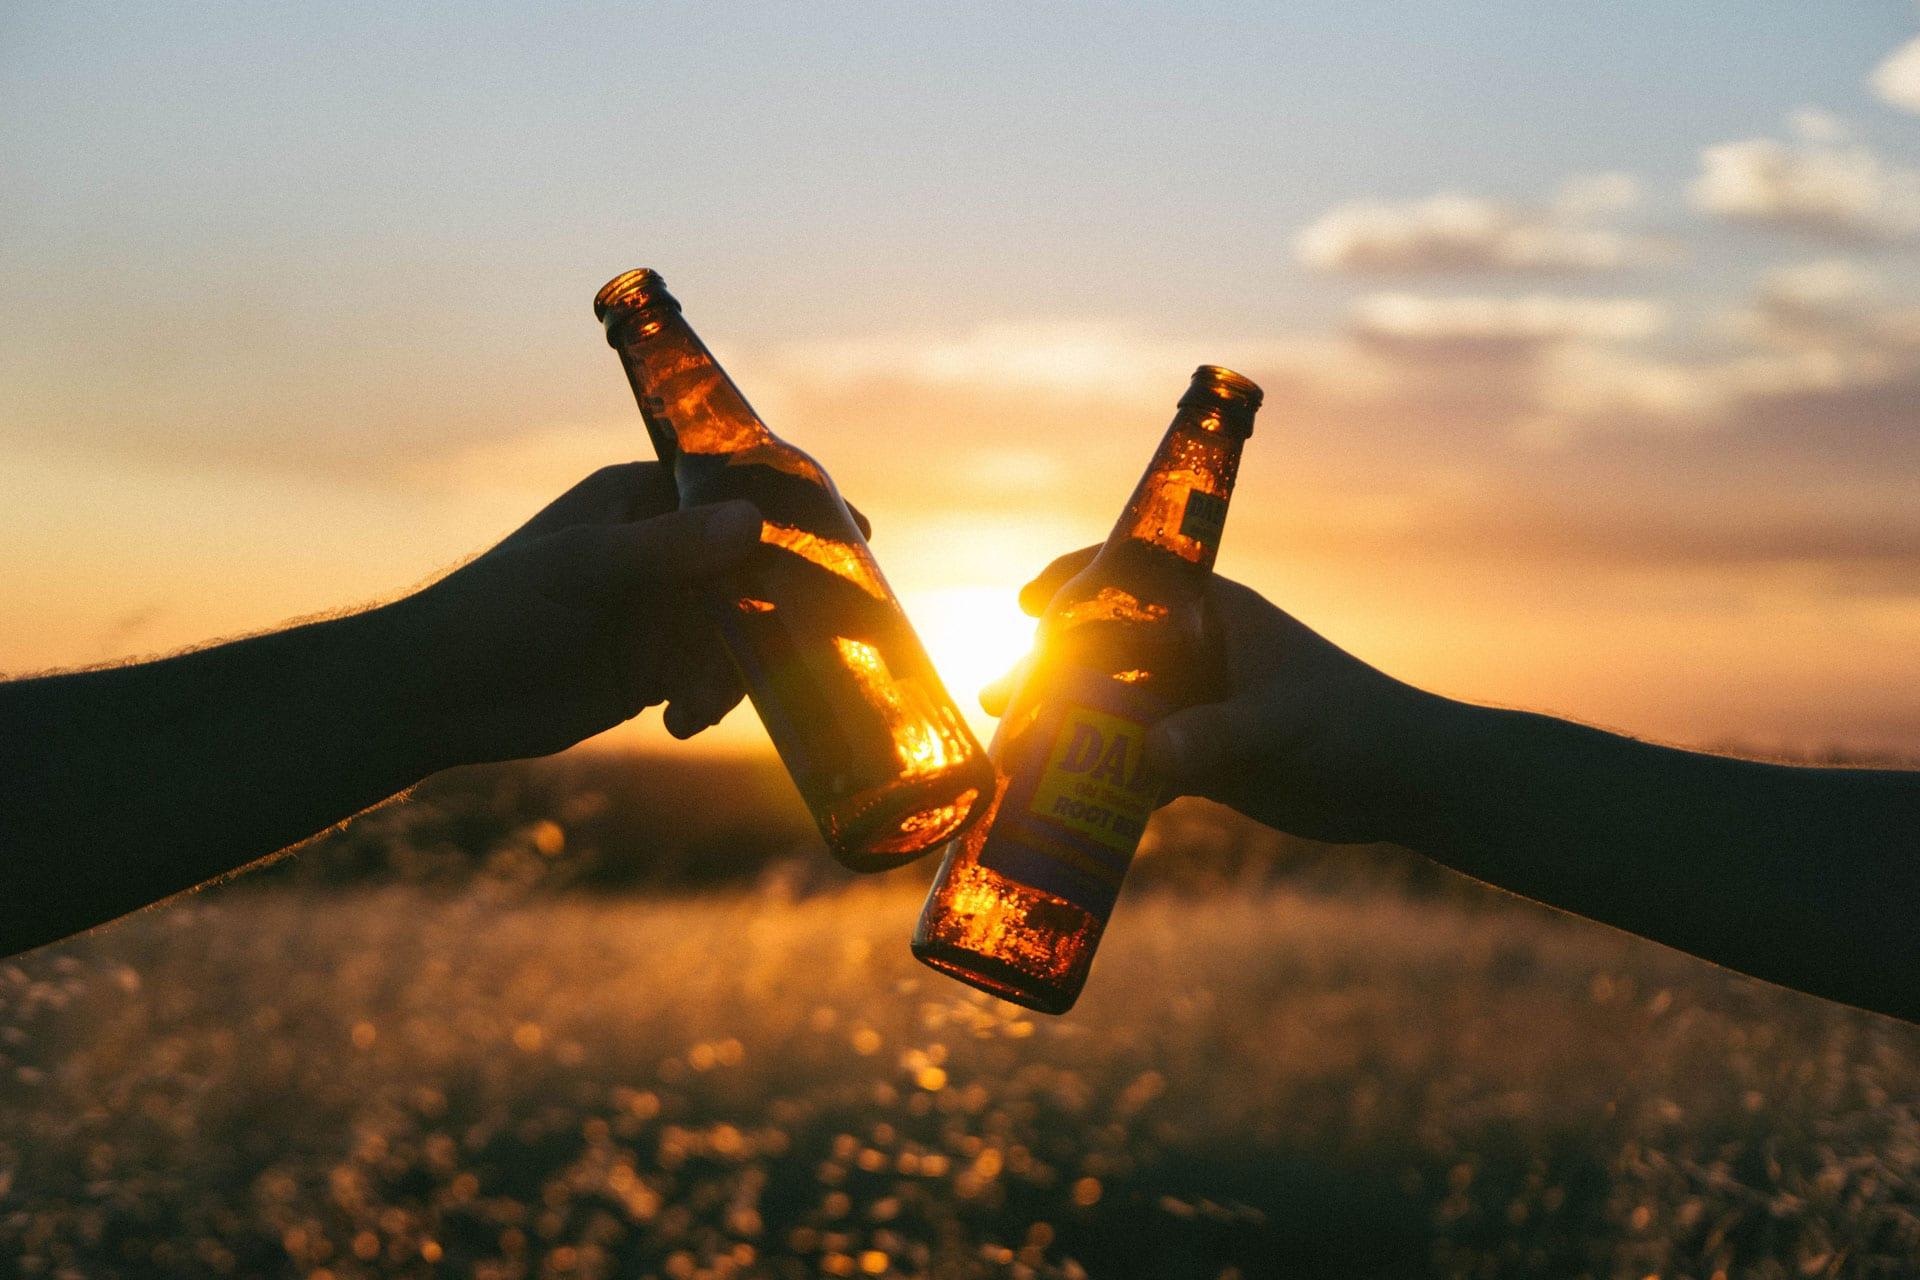 Partners having a beer